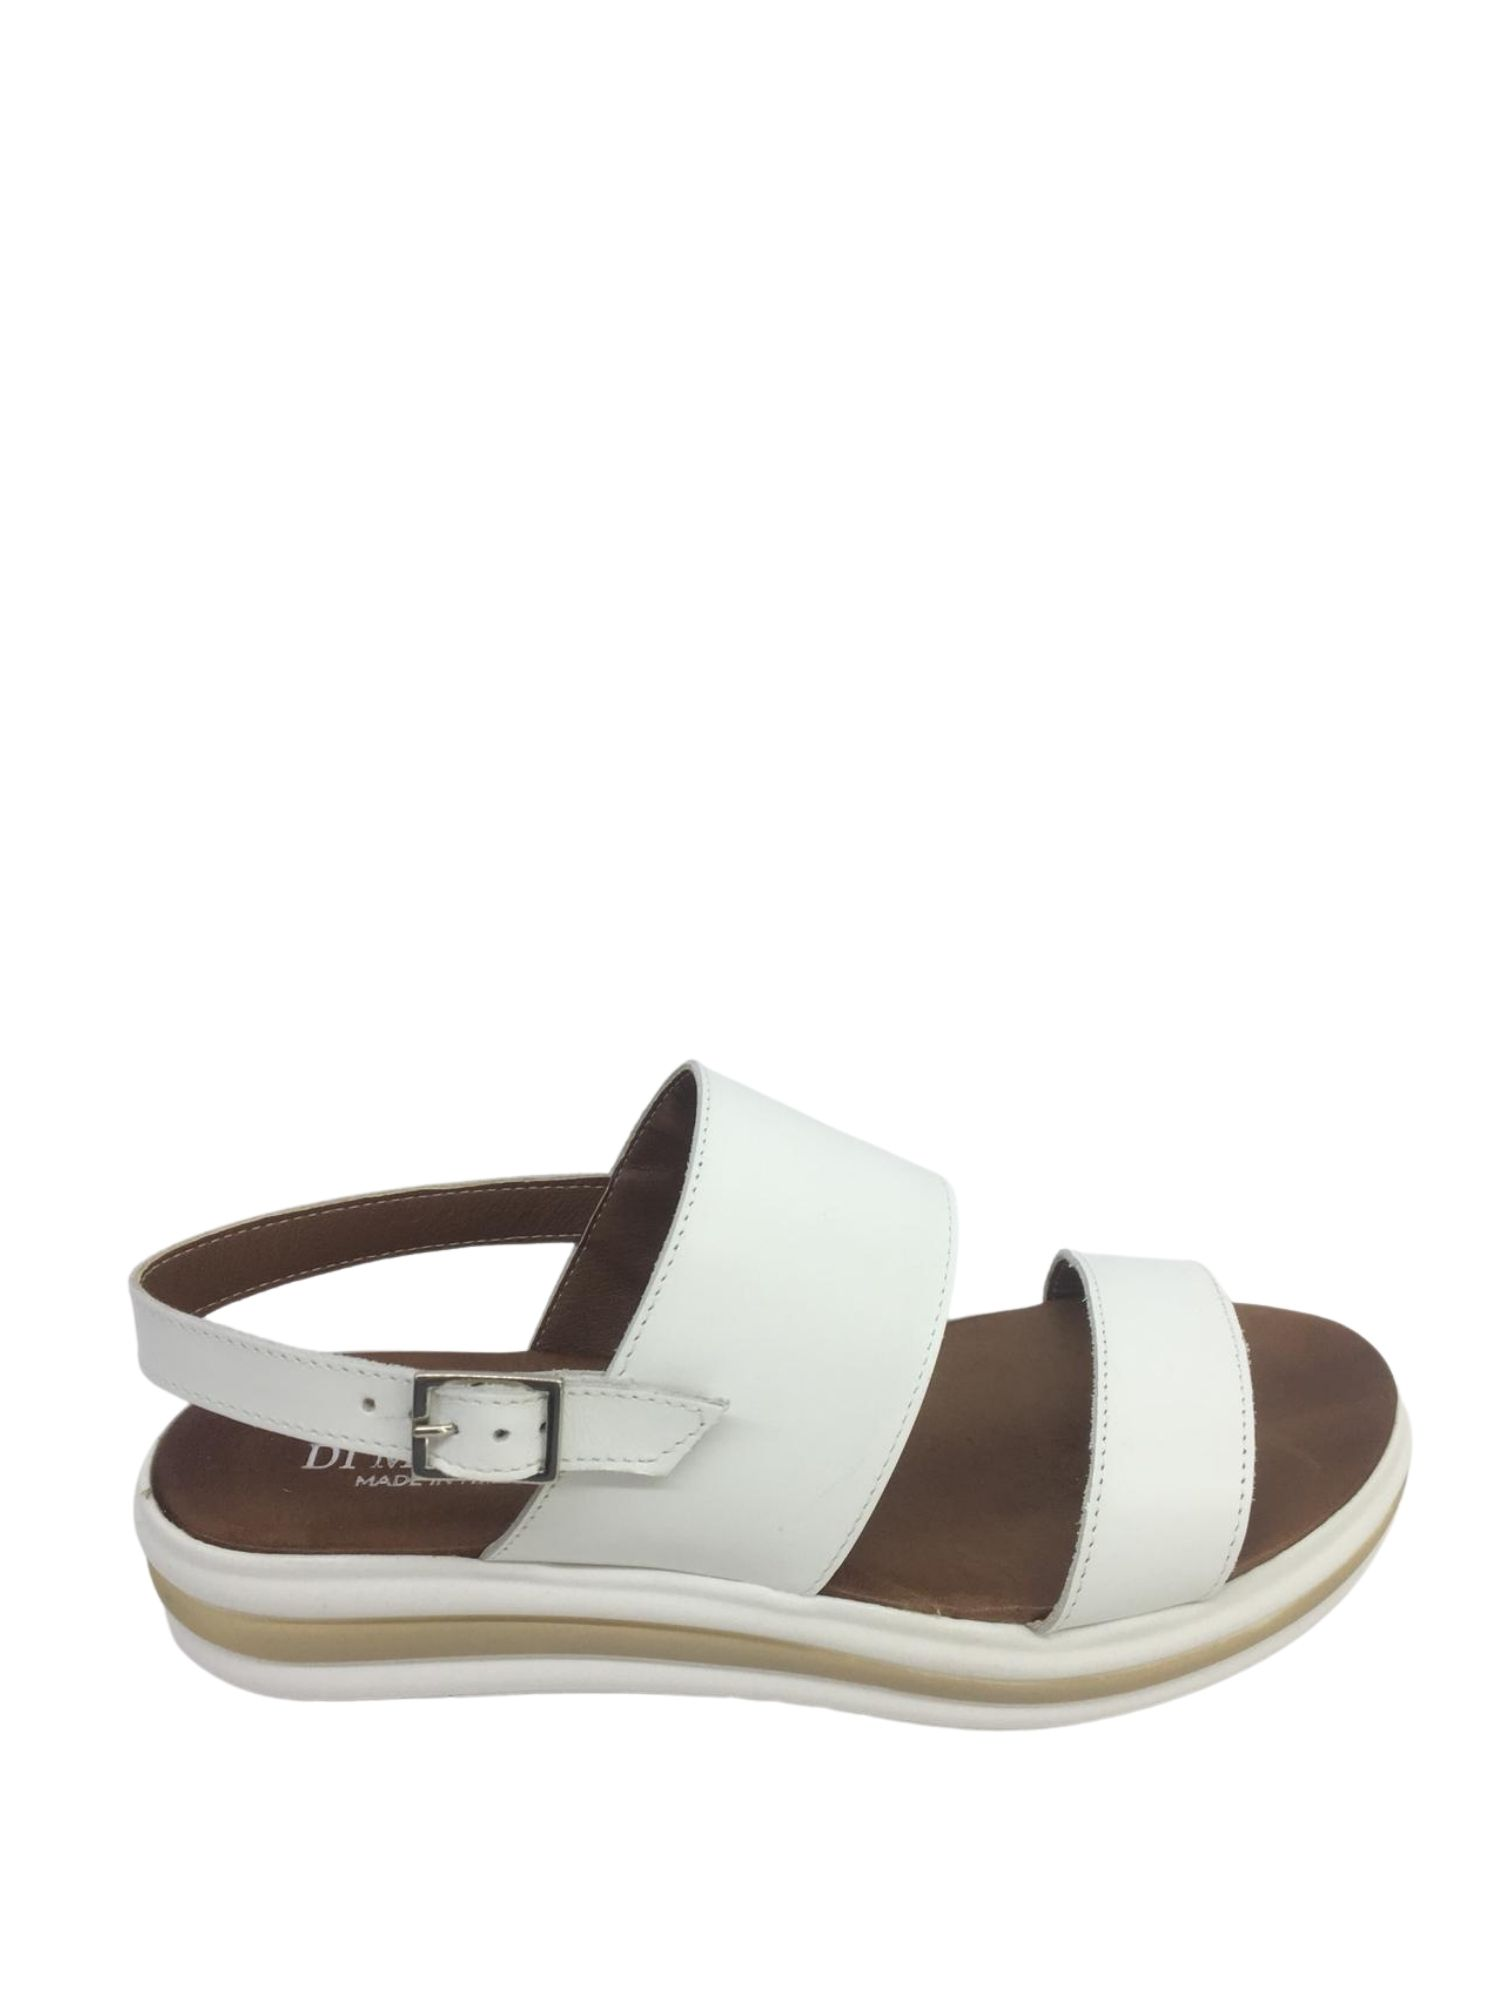 Sandalo Made in Italy 413 Bianco